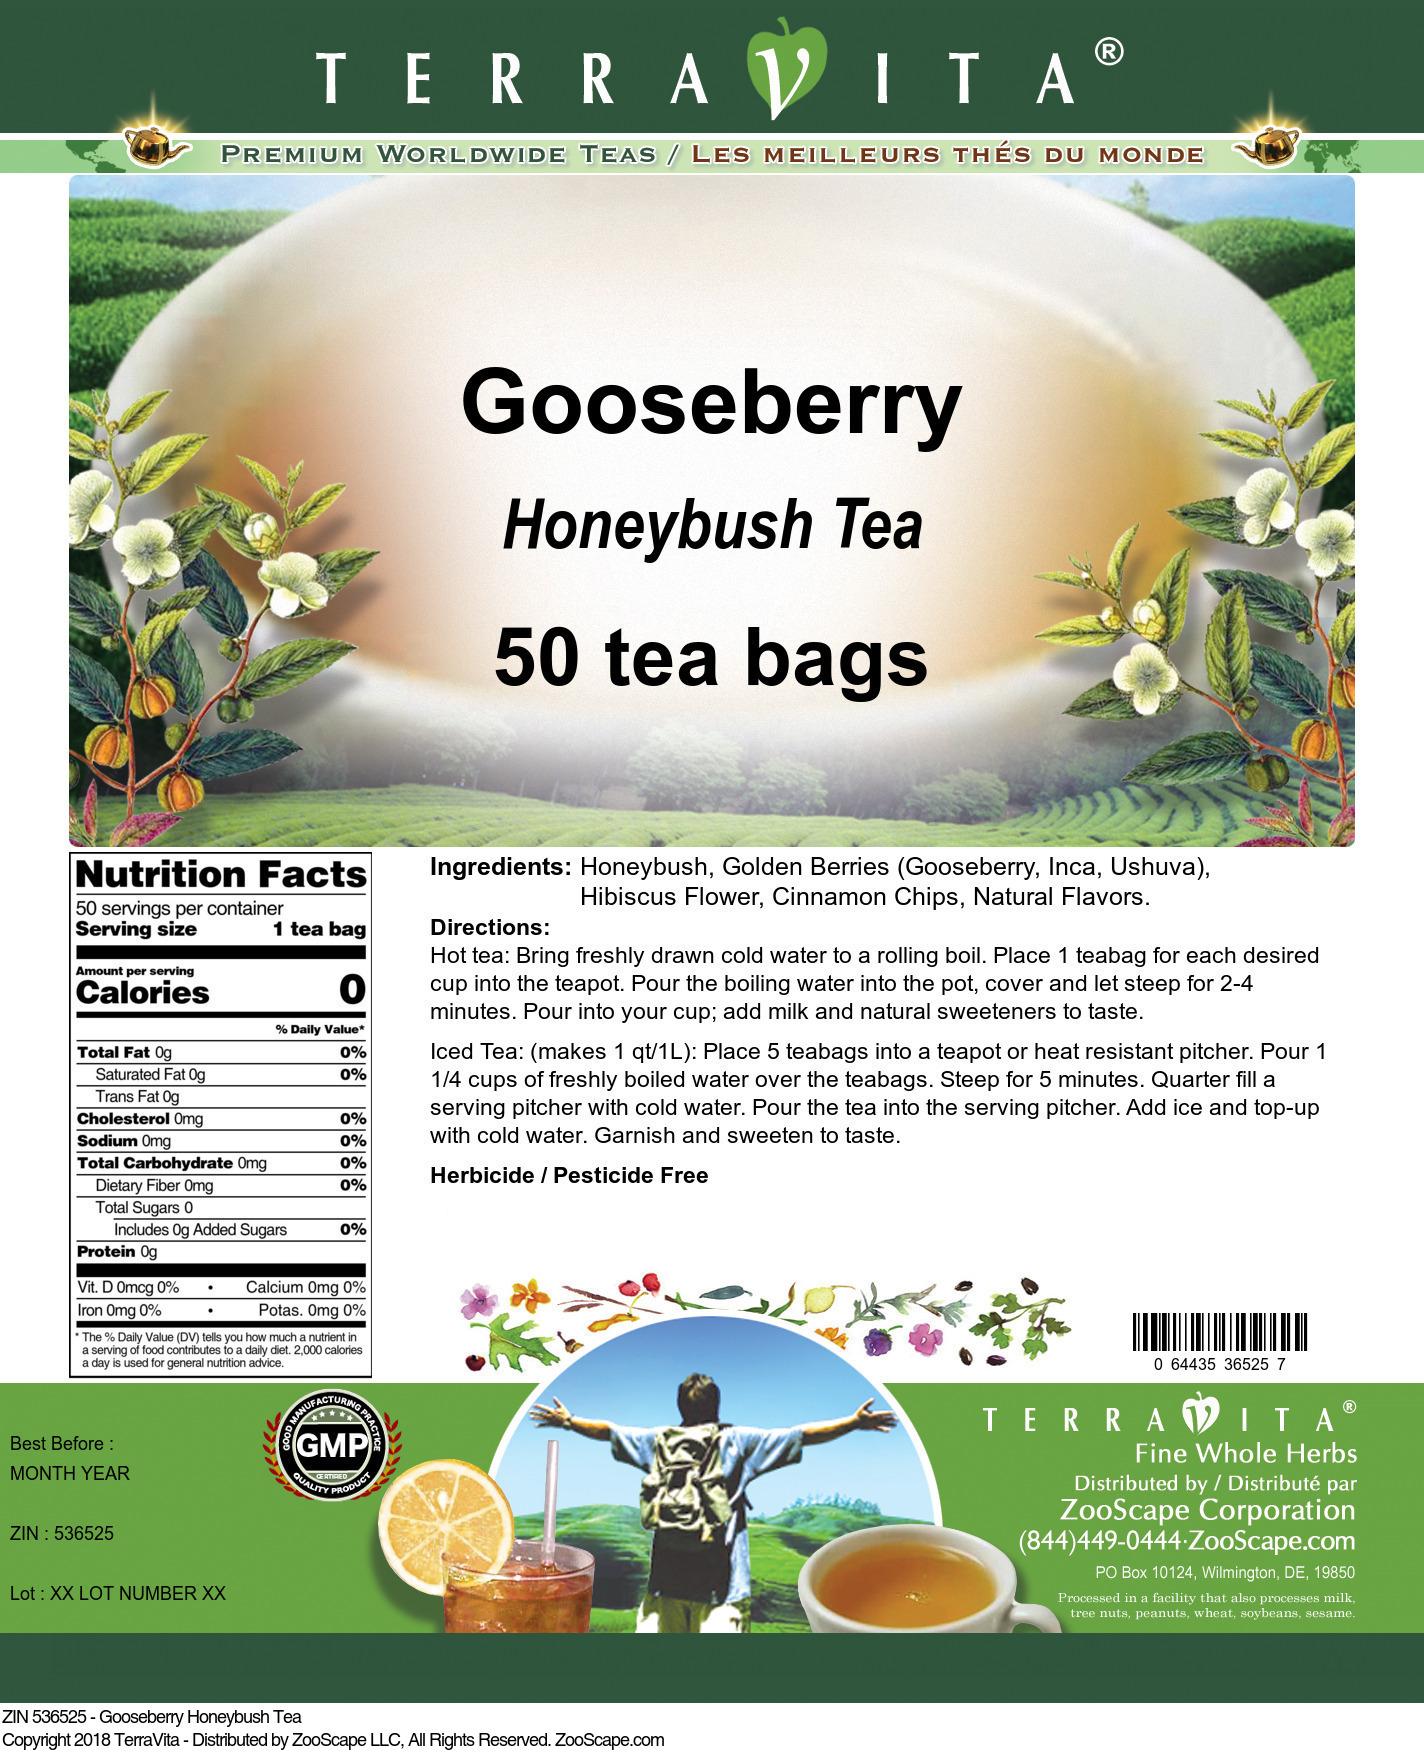 Gooseberry Honeybush Tea